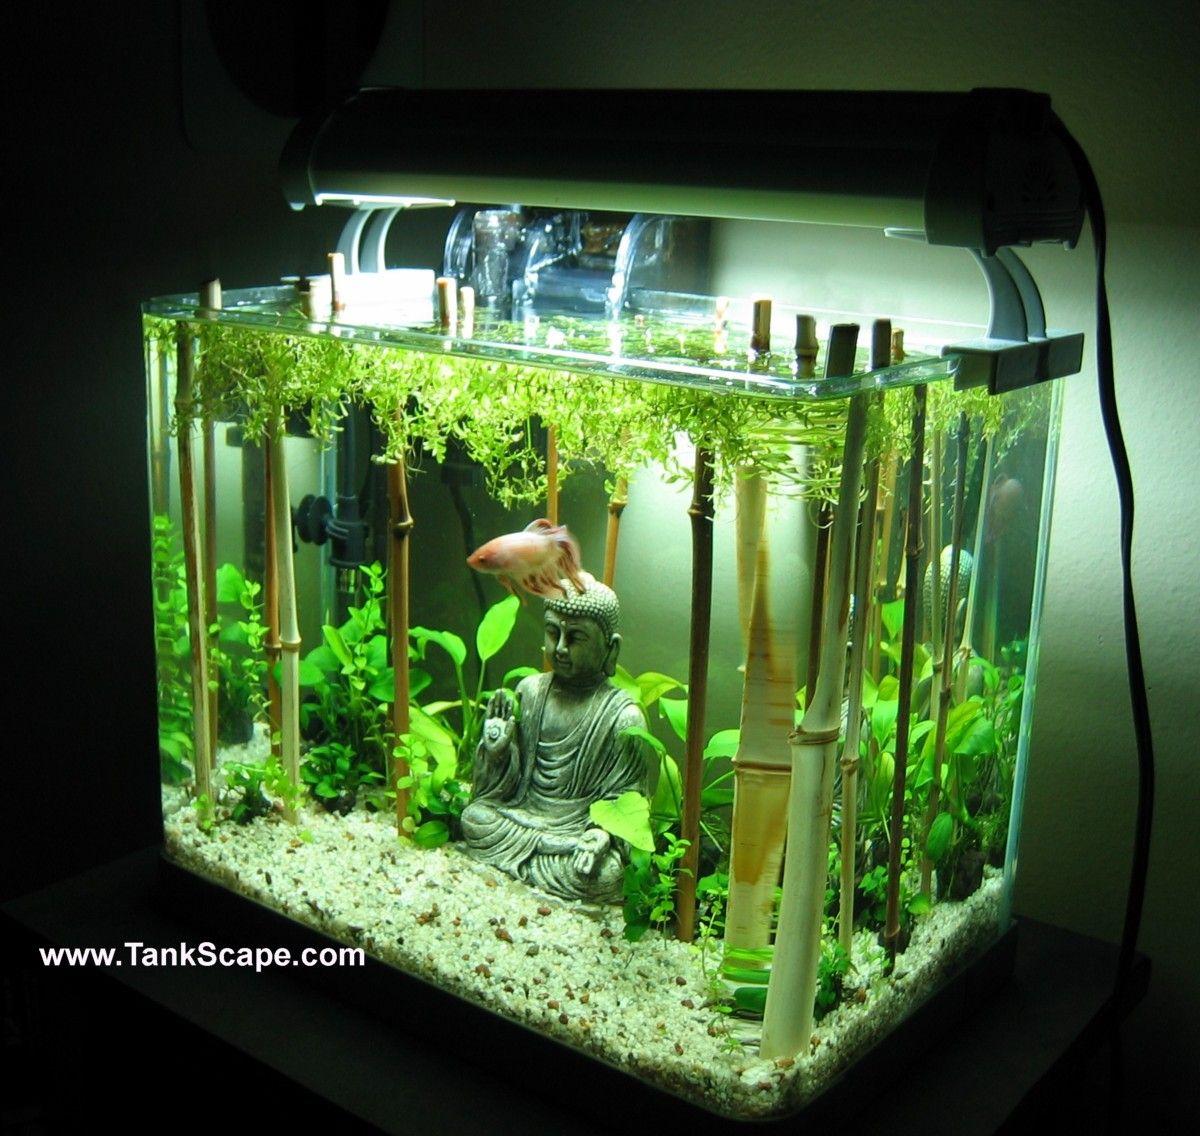 Fish aquarium for betta - Tank Scape My Planted Buddha Betta Tank